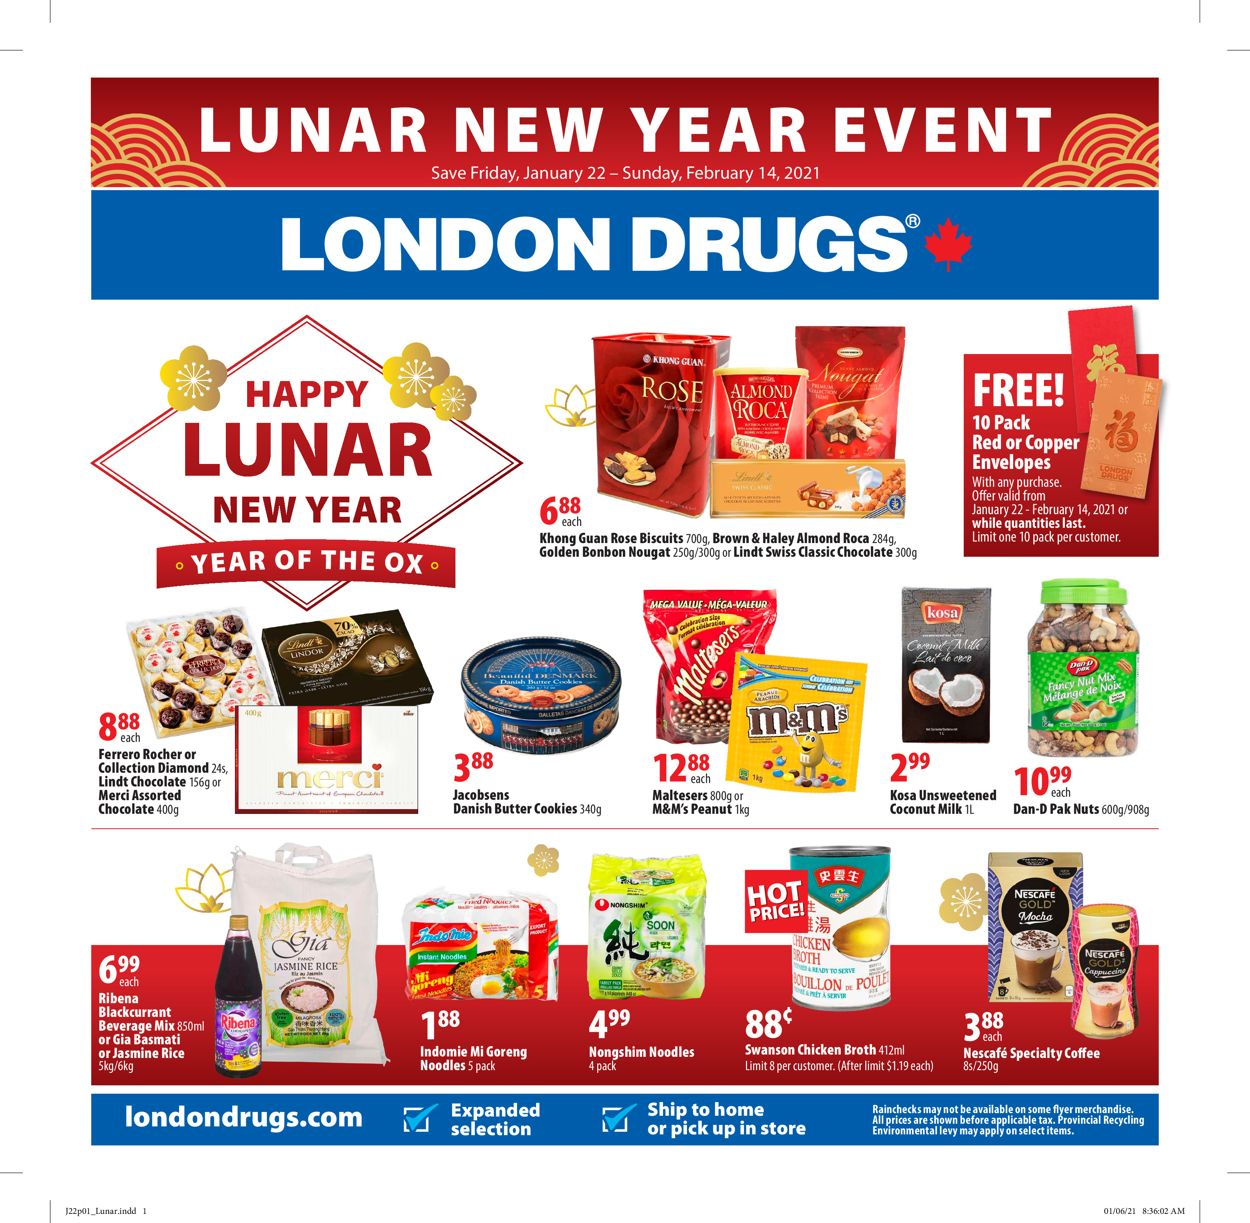 London Drugs- Lunar New Year 2021 Flyer - 01/22-02/14/2021